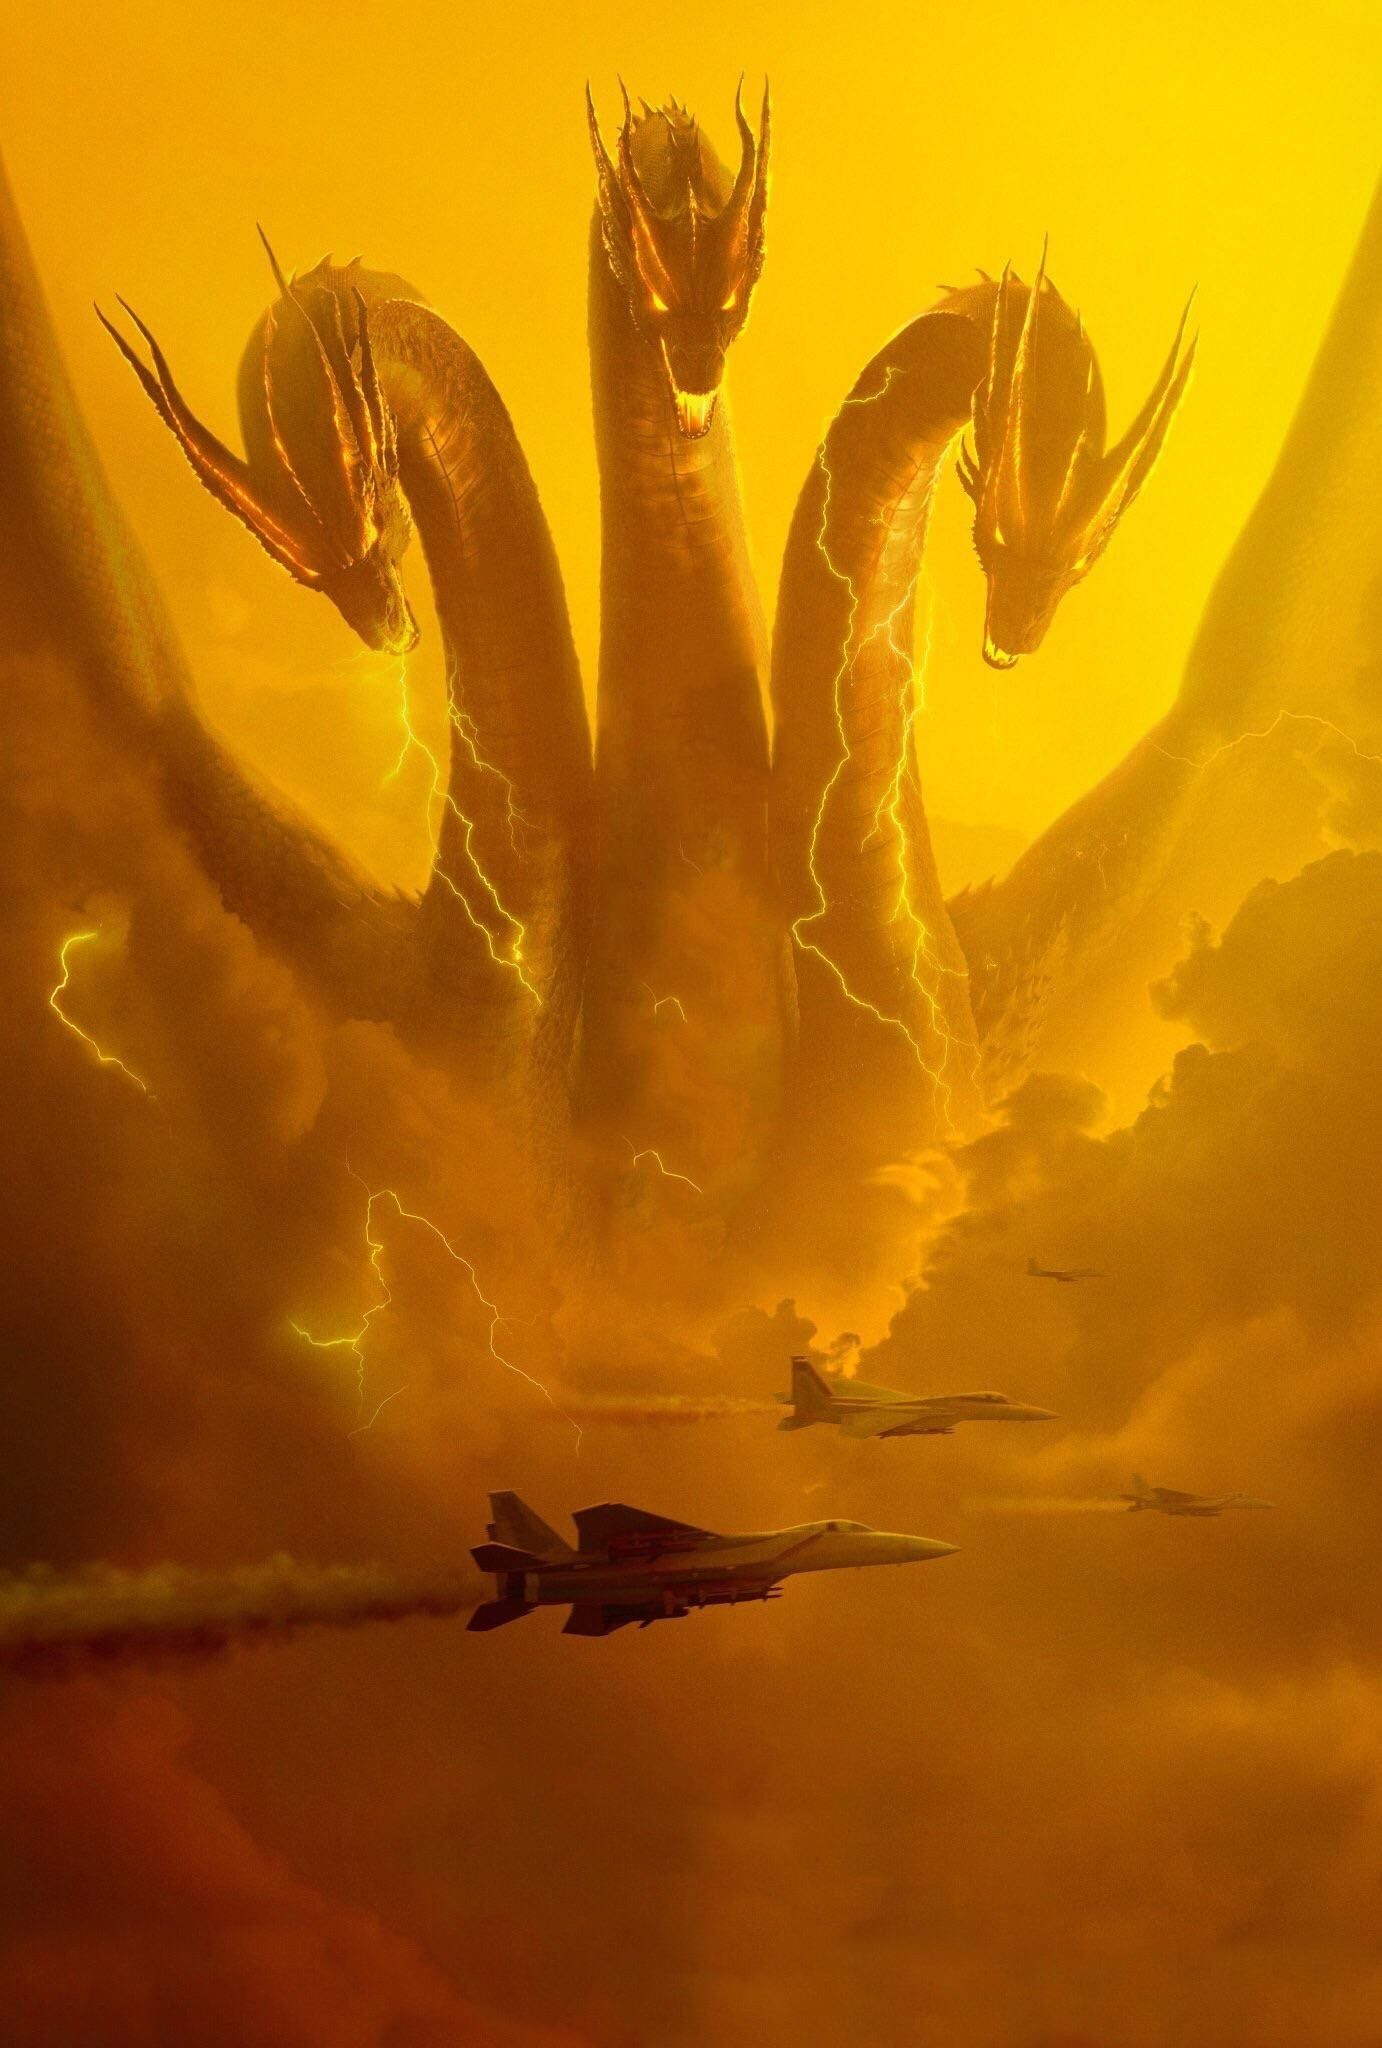 Official King Ghidorah 2019 Poster Textless Godzilla And Kaiju